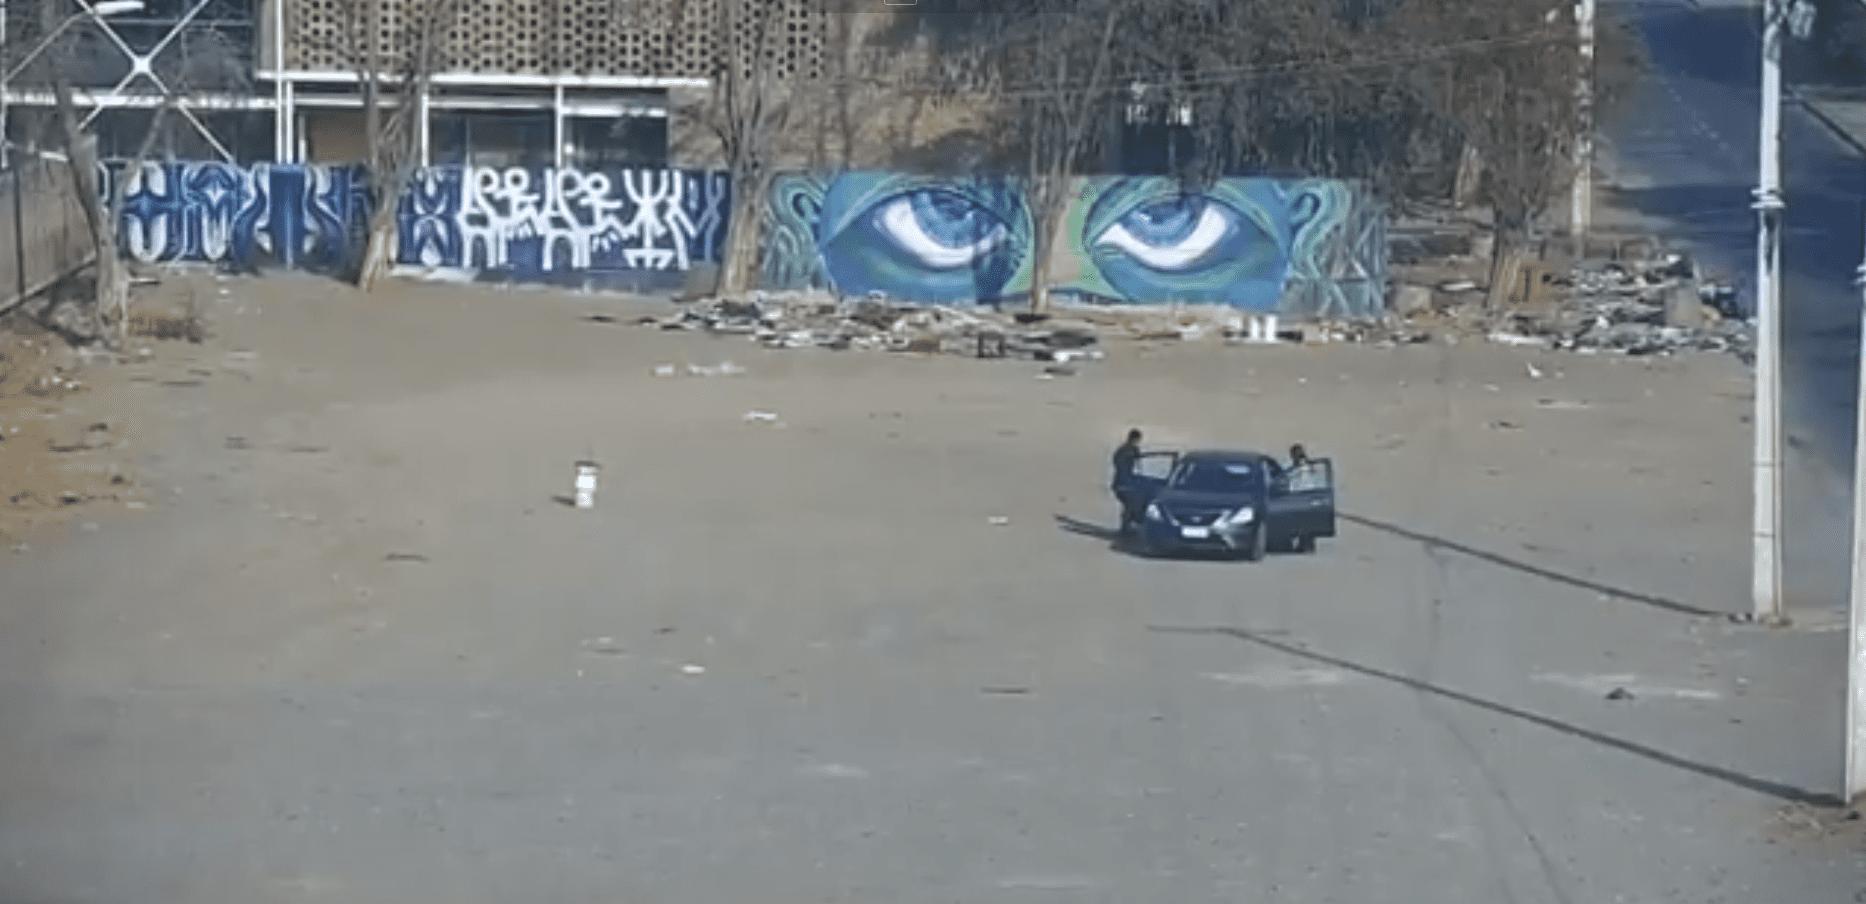 El auto se detuvo en plena calle. Fuente: Twitter/MuniLaPintana